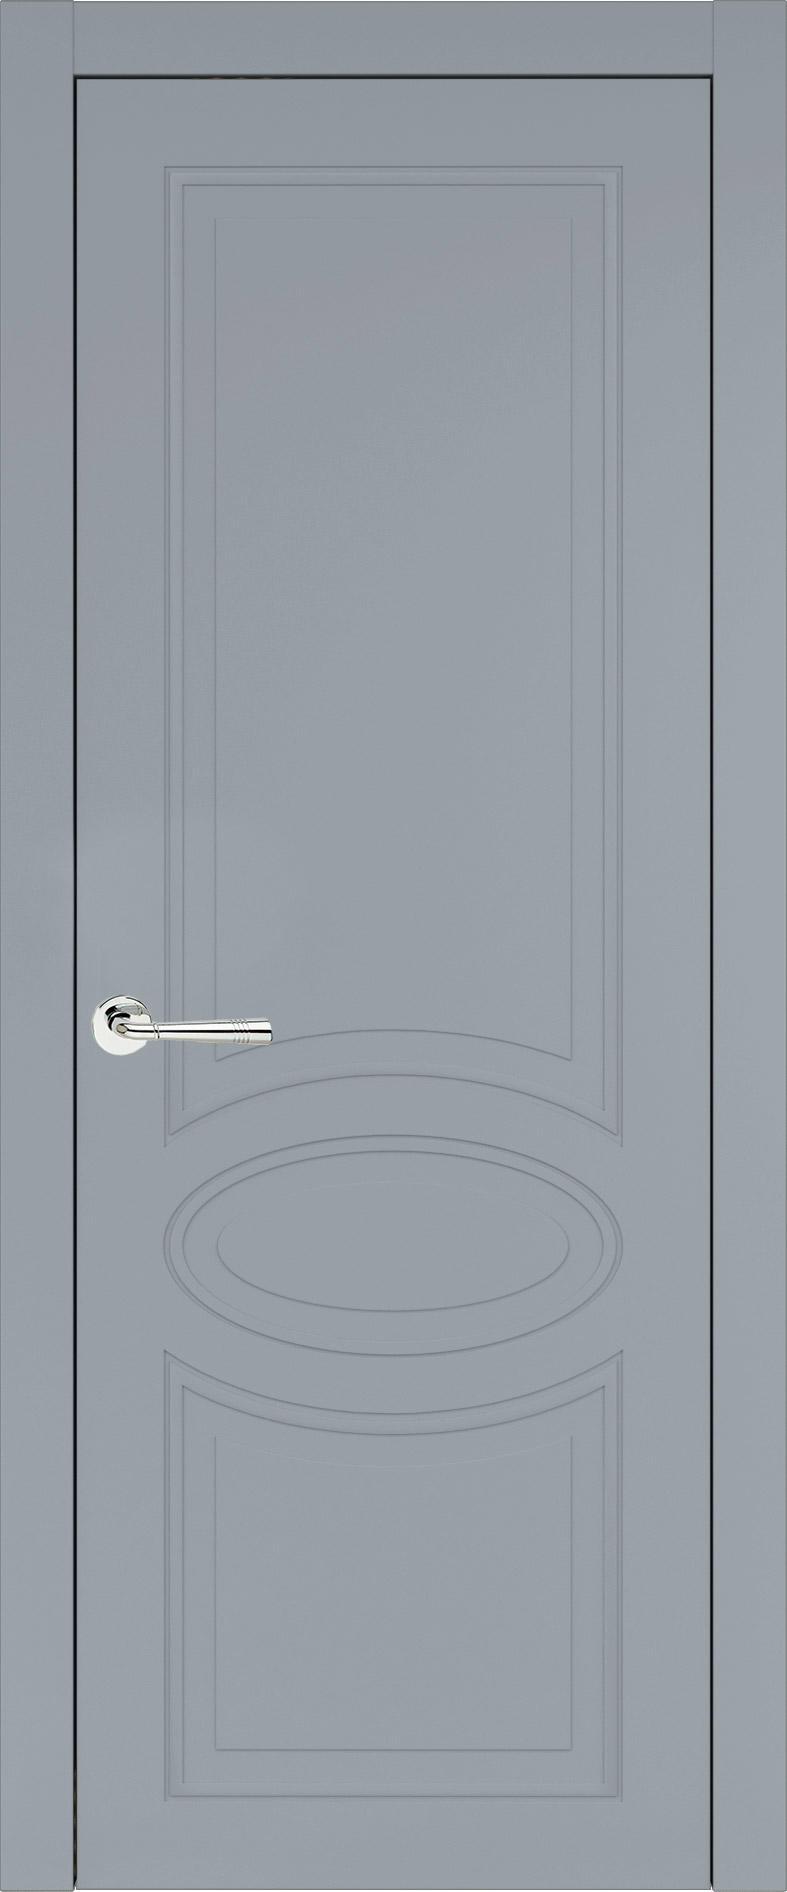 Florencia Neo Classic цвет - Серебристо-серая эмаль (RAL 7045) Без стекла (ДГ)